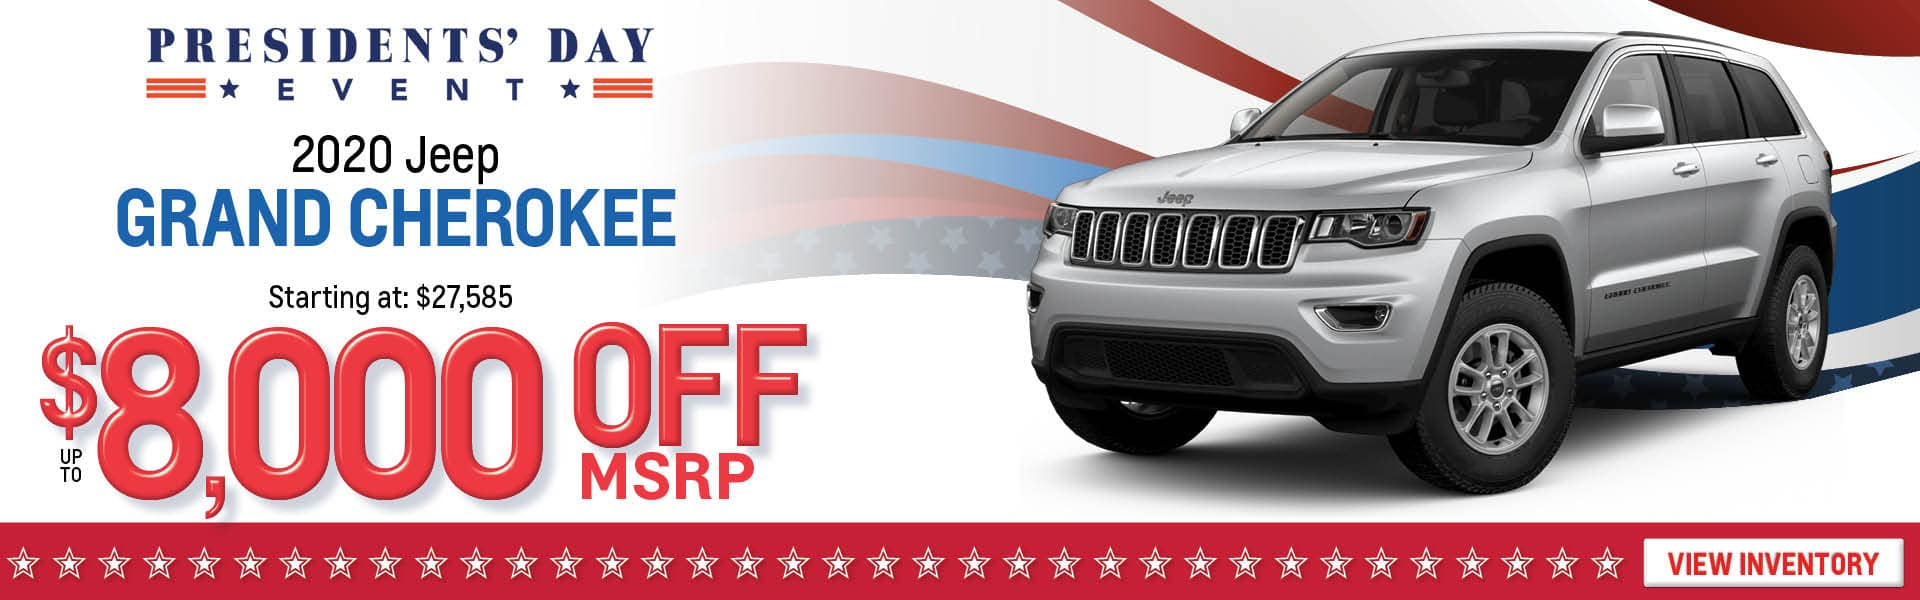 New Jeep Grand Cherokee For Sale in Atlanta, Georgia